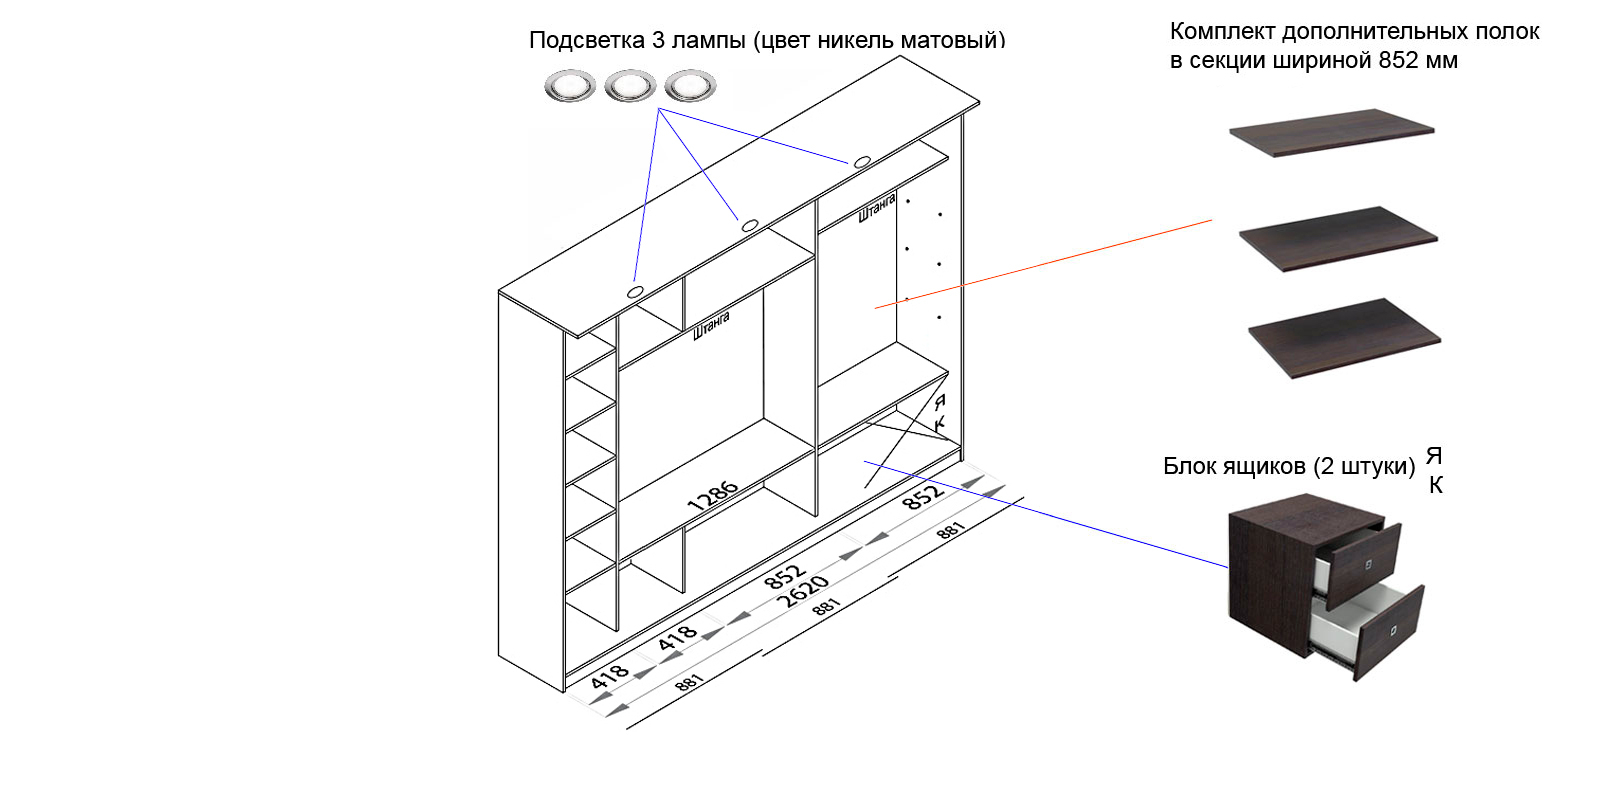 Шкаф-купе трехдверный Манчестер 260 см (дуб феррара+зеркало) от HomeMe.ru